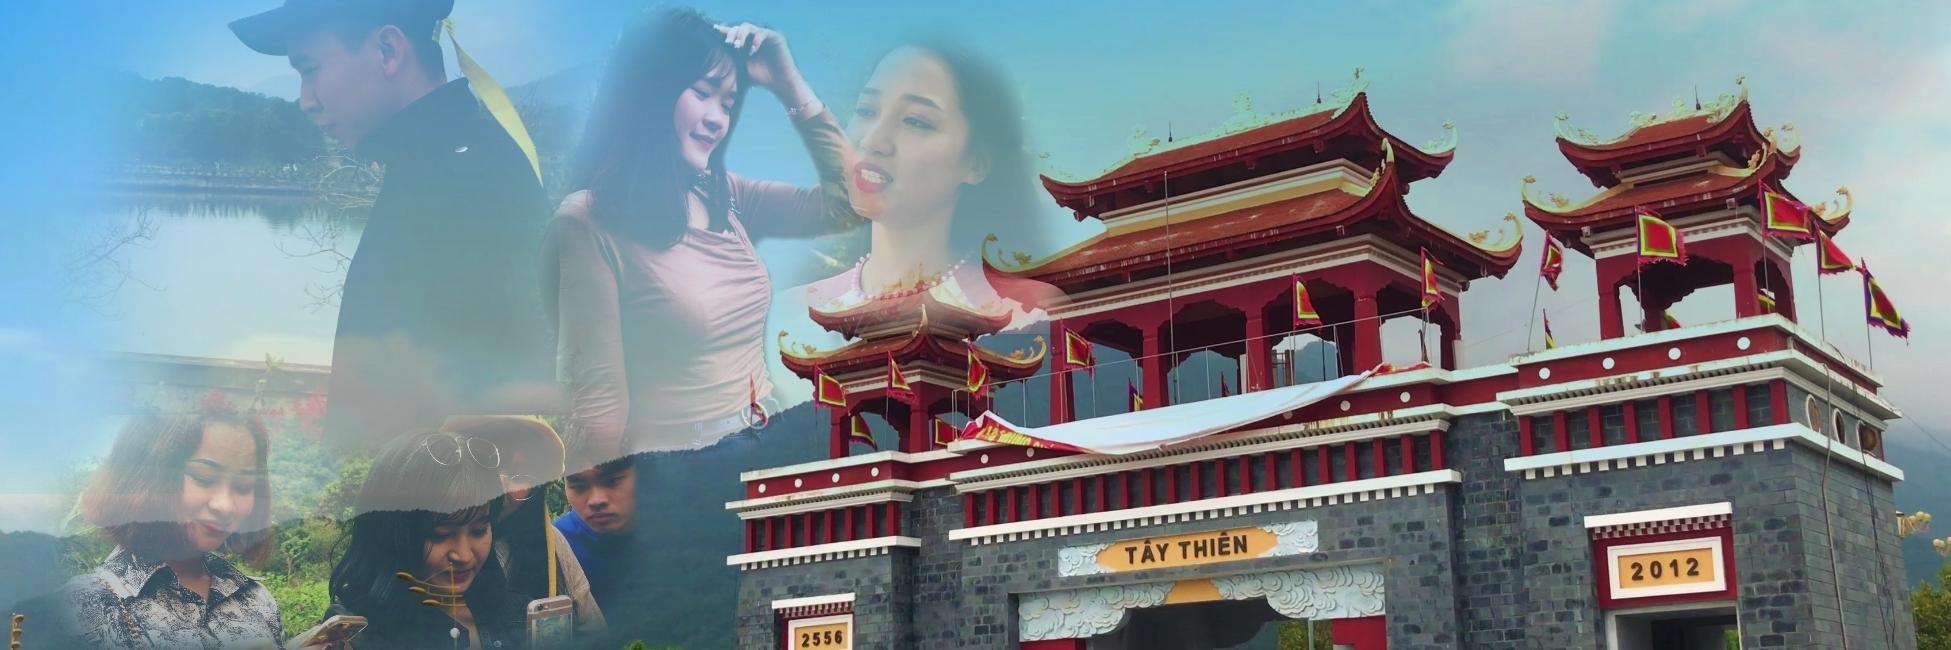 https://gody.vn/blog/vuongvp19986773/post/tay-thien-hang-van-nguoi-hanh-huong-bai-phat-dau-nam-2020-6292